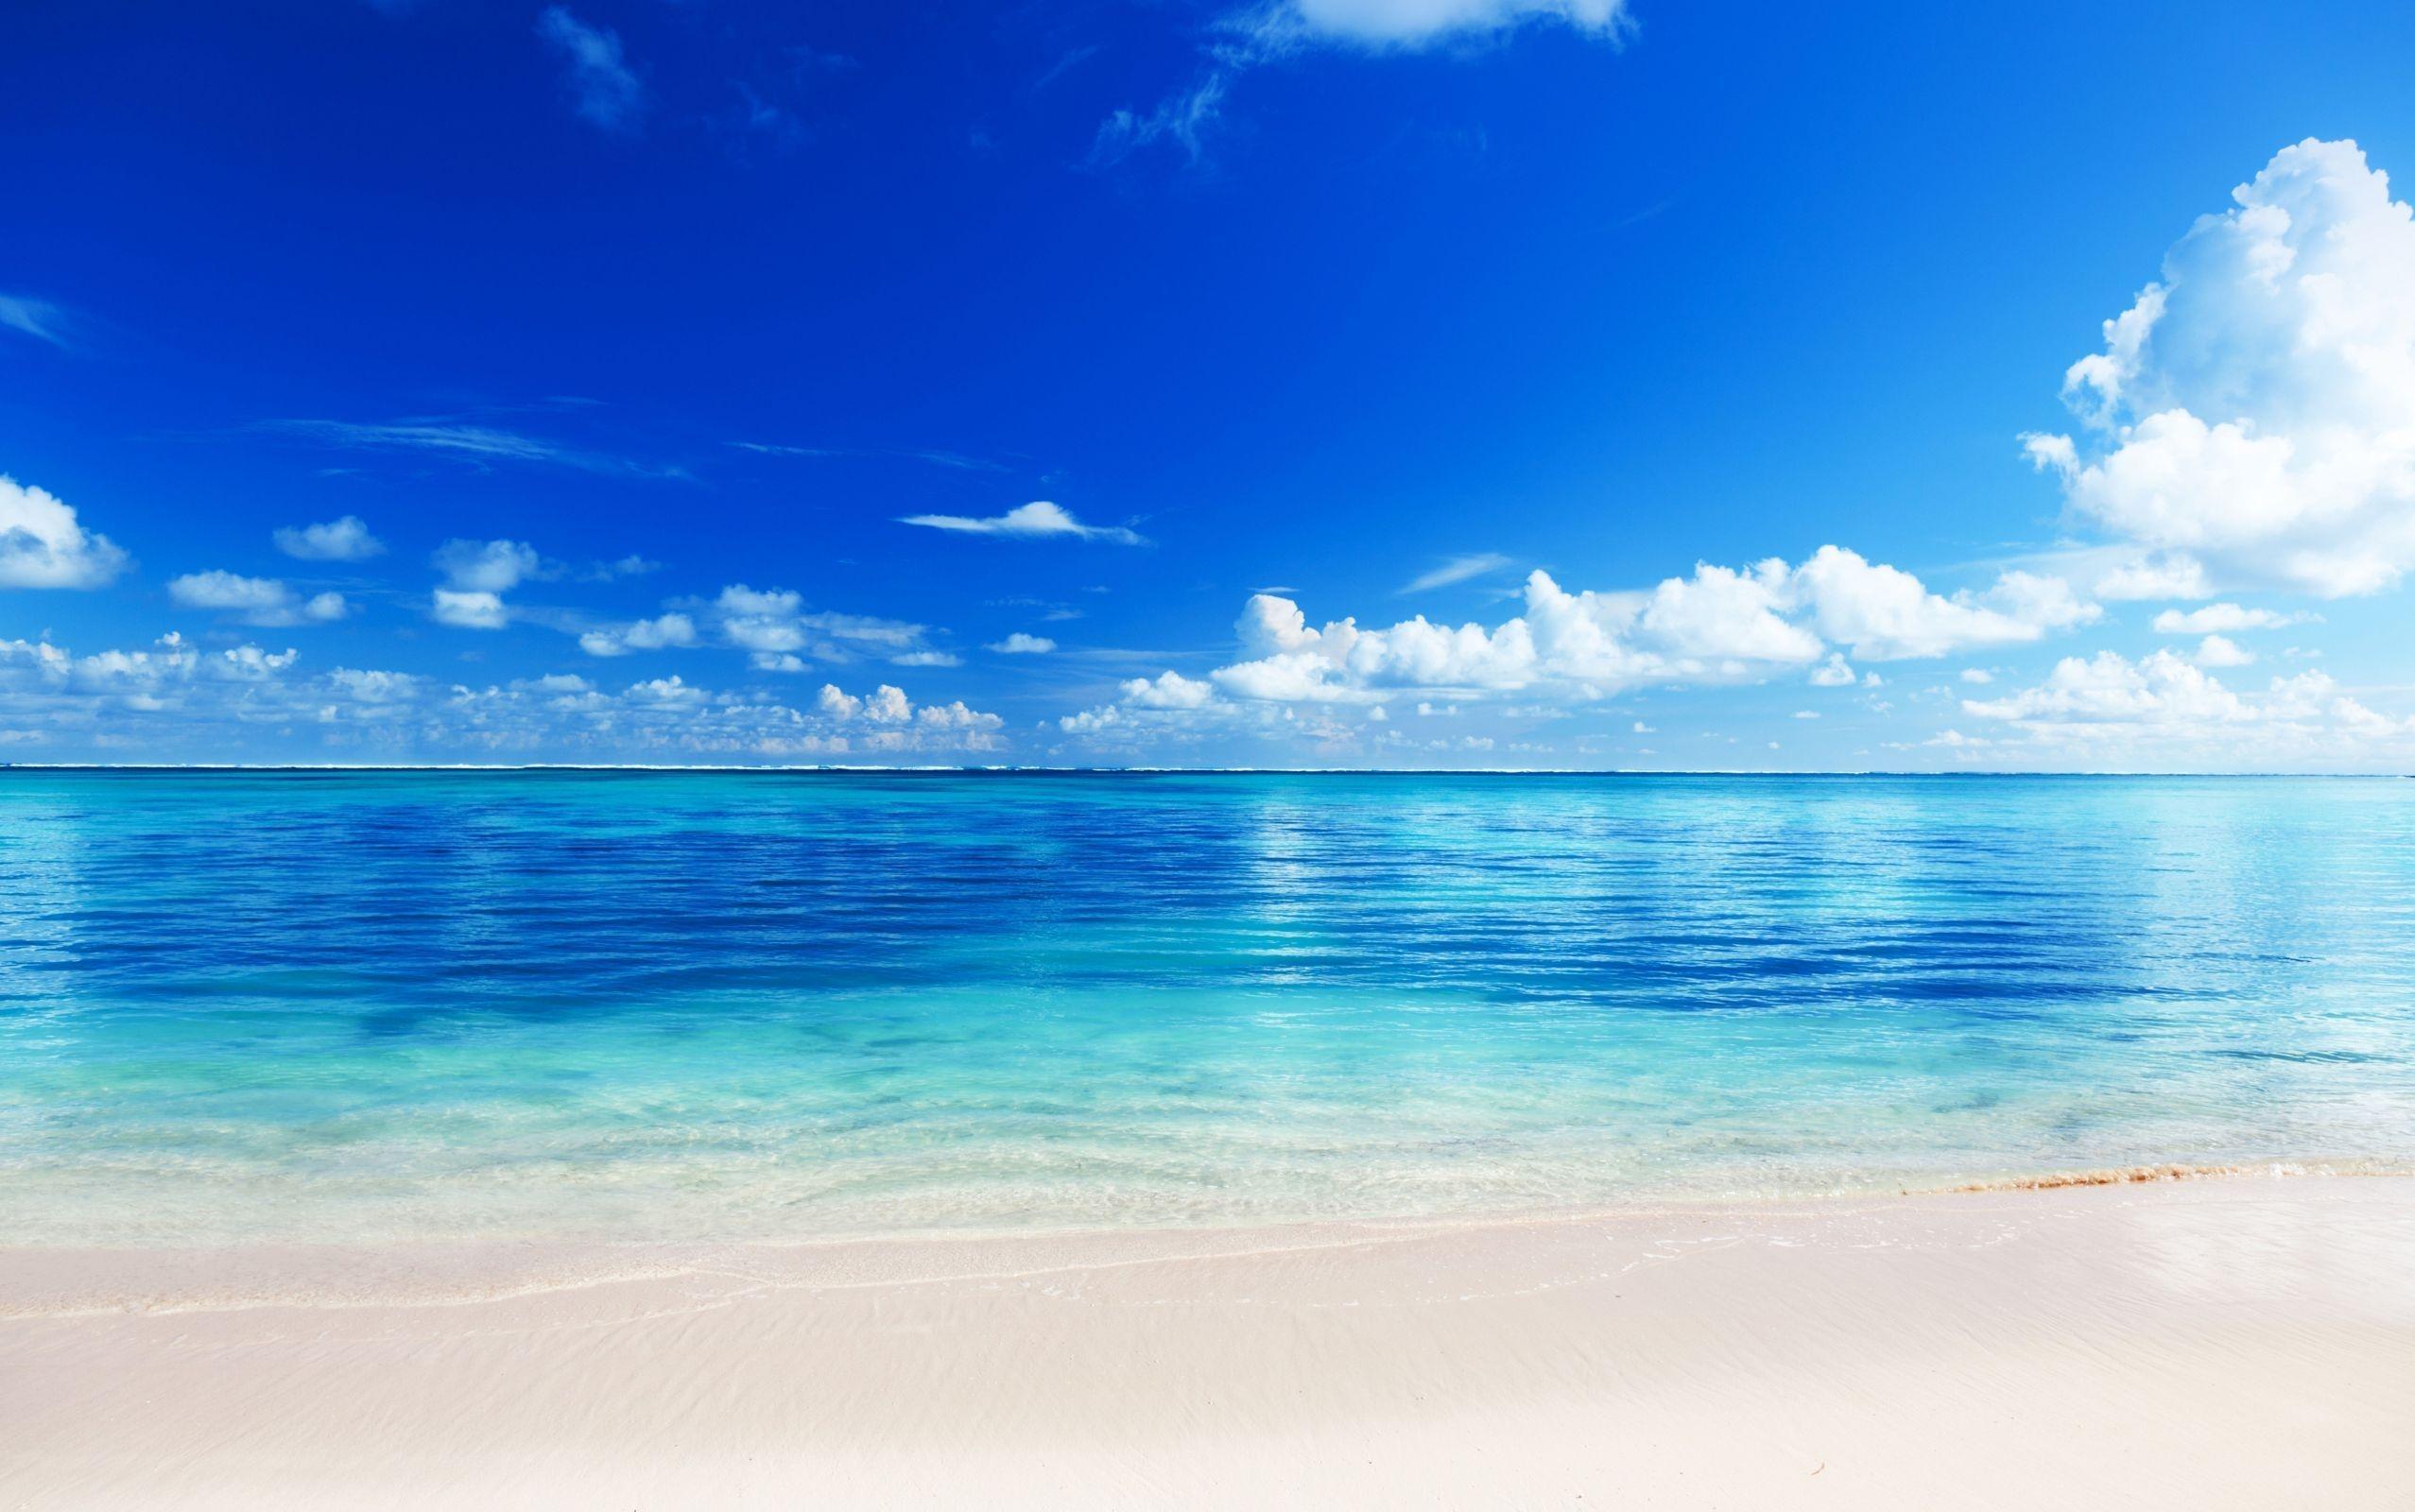 wallpaper : sea, beach, horizon, sand, tropics 2555x1600 - wallup